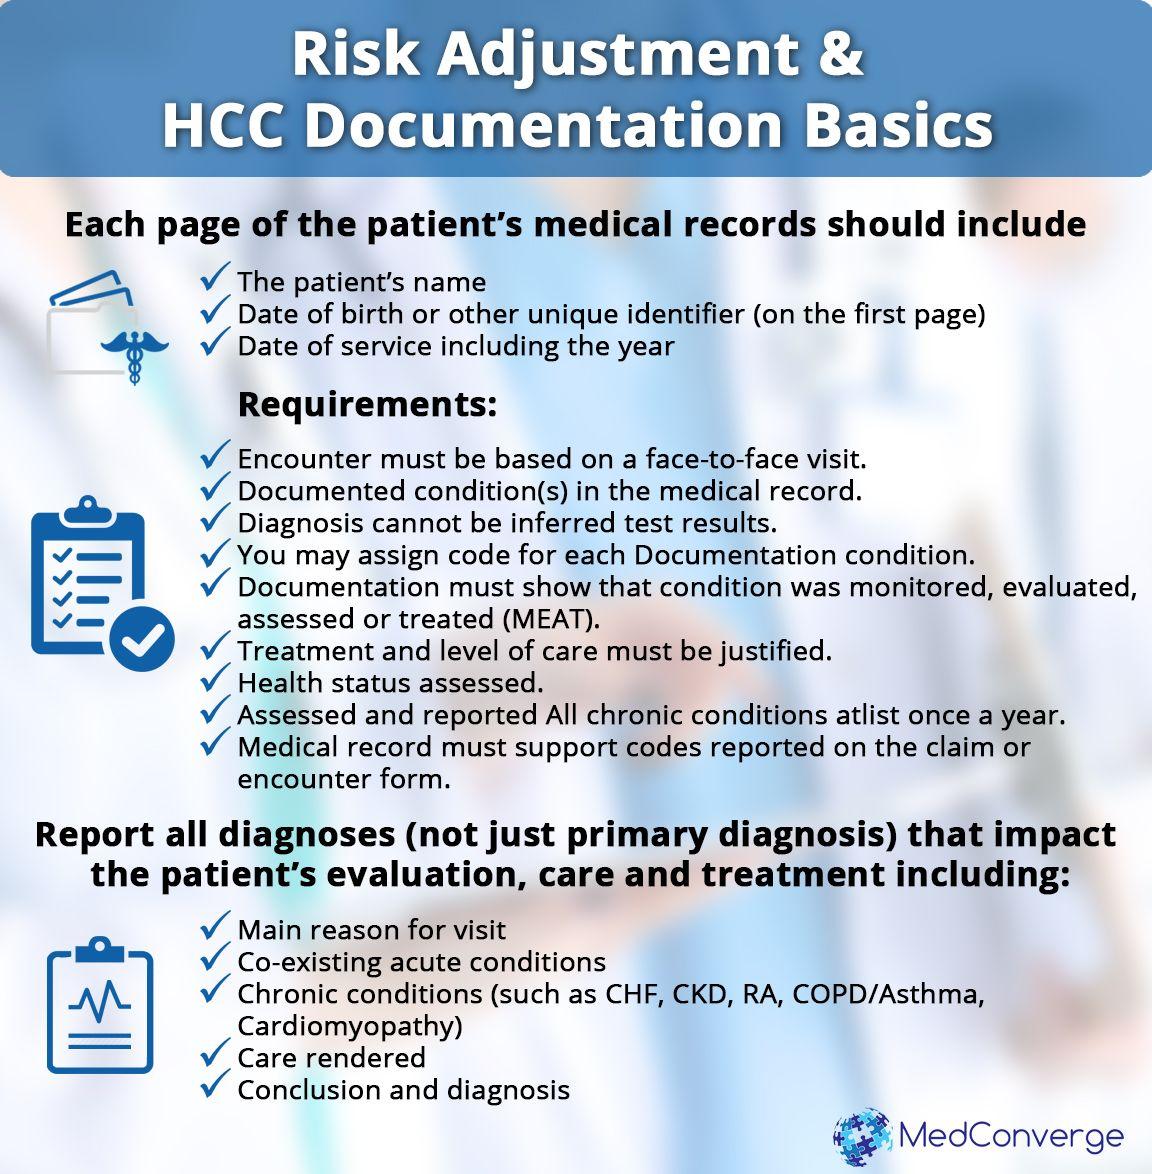 risk adjustment and hcc documentation basics